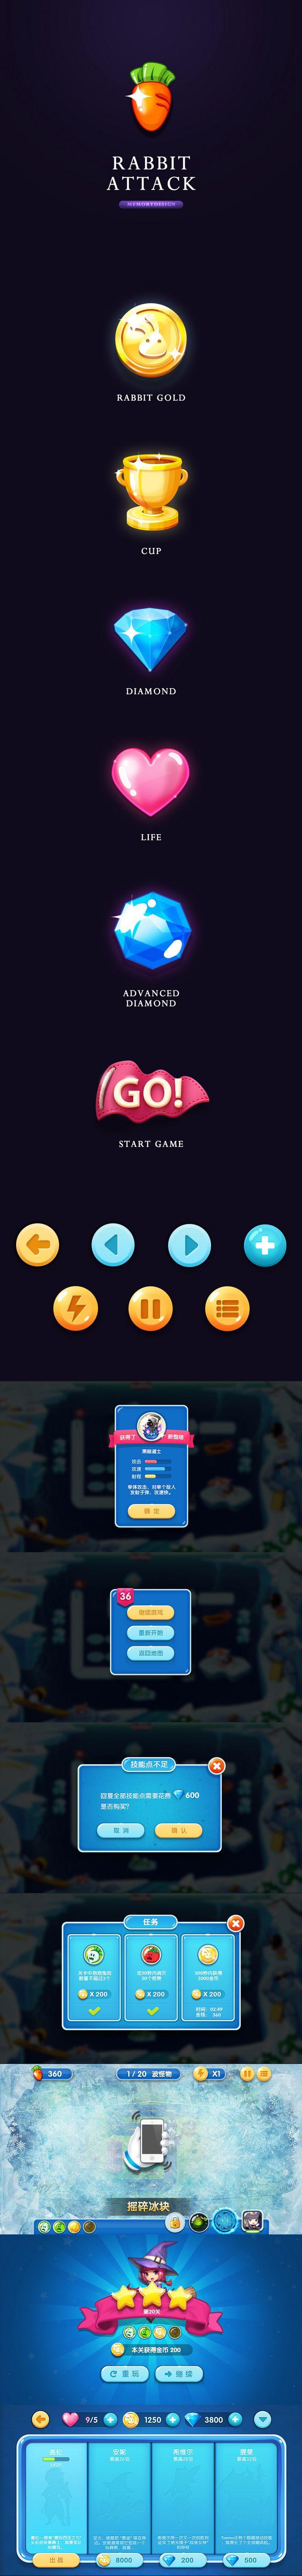 原创作品:Game Ui Design ...